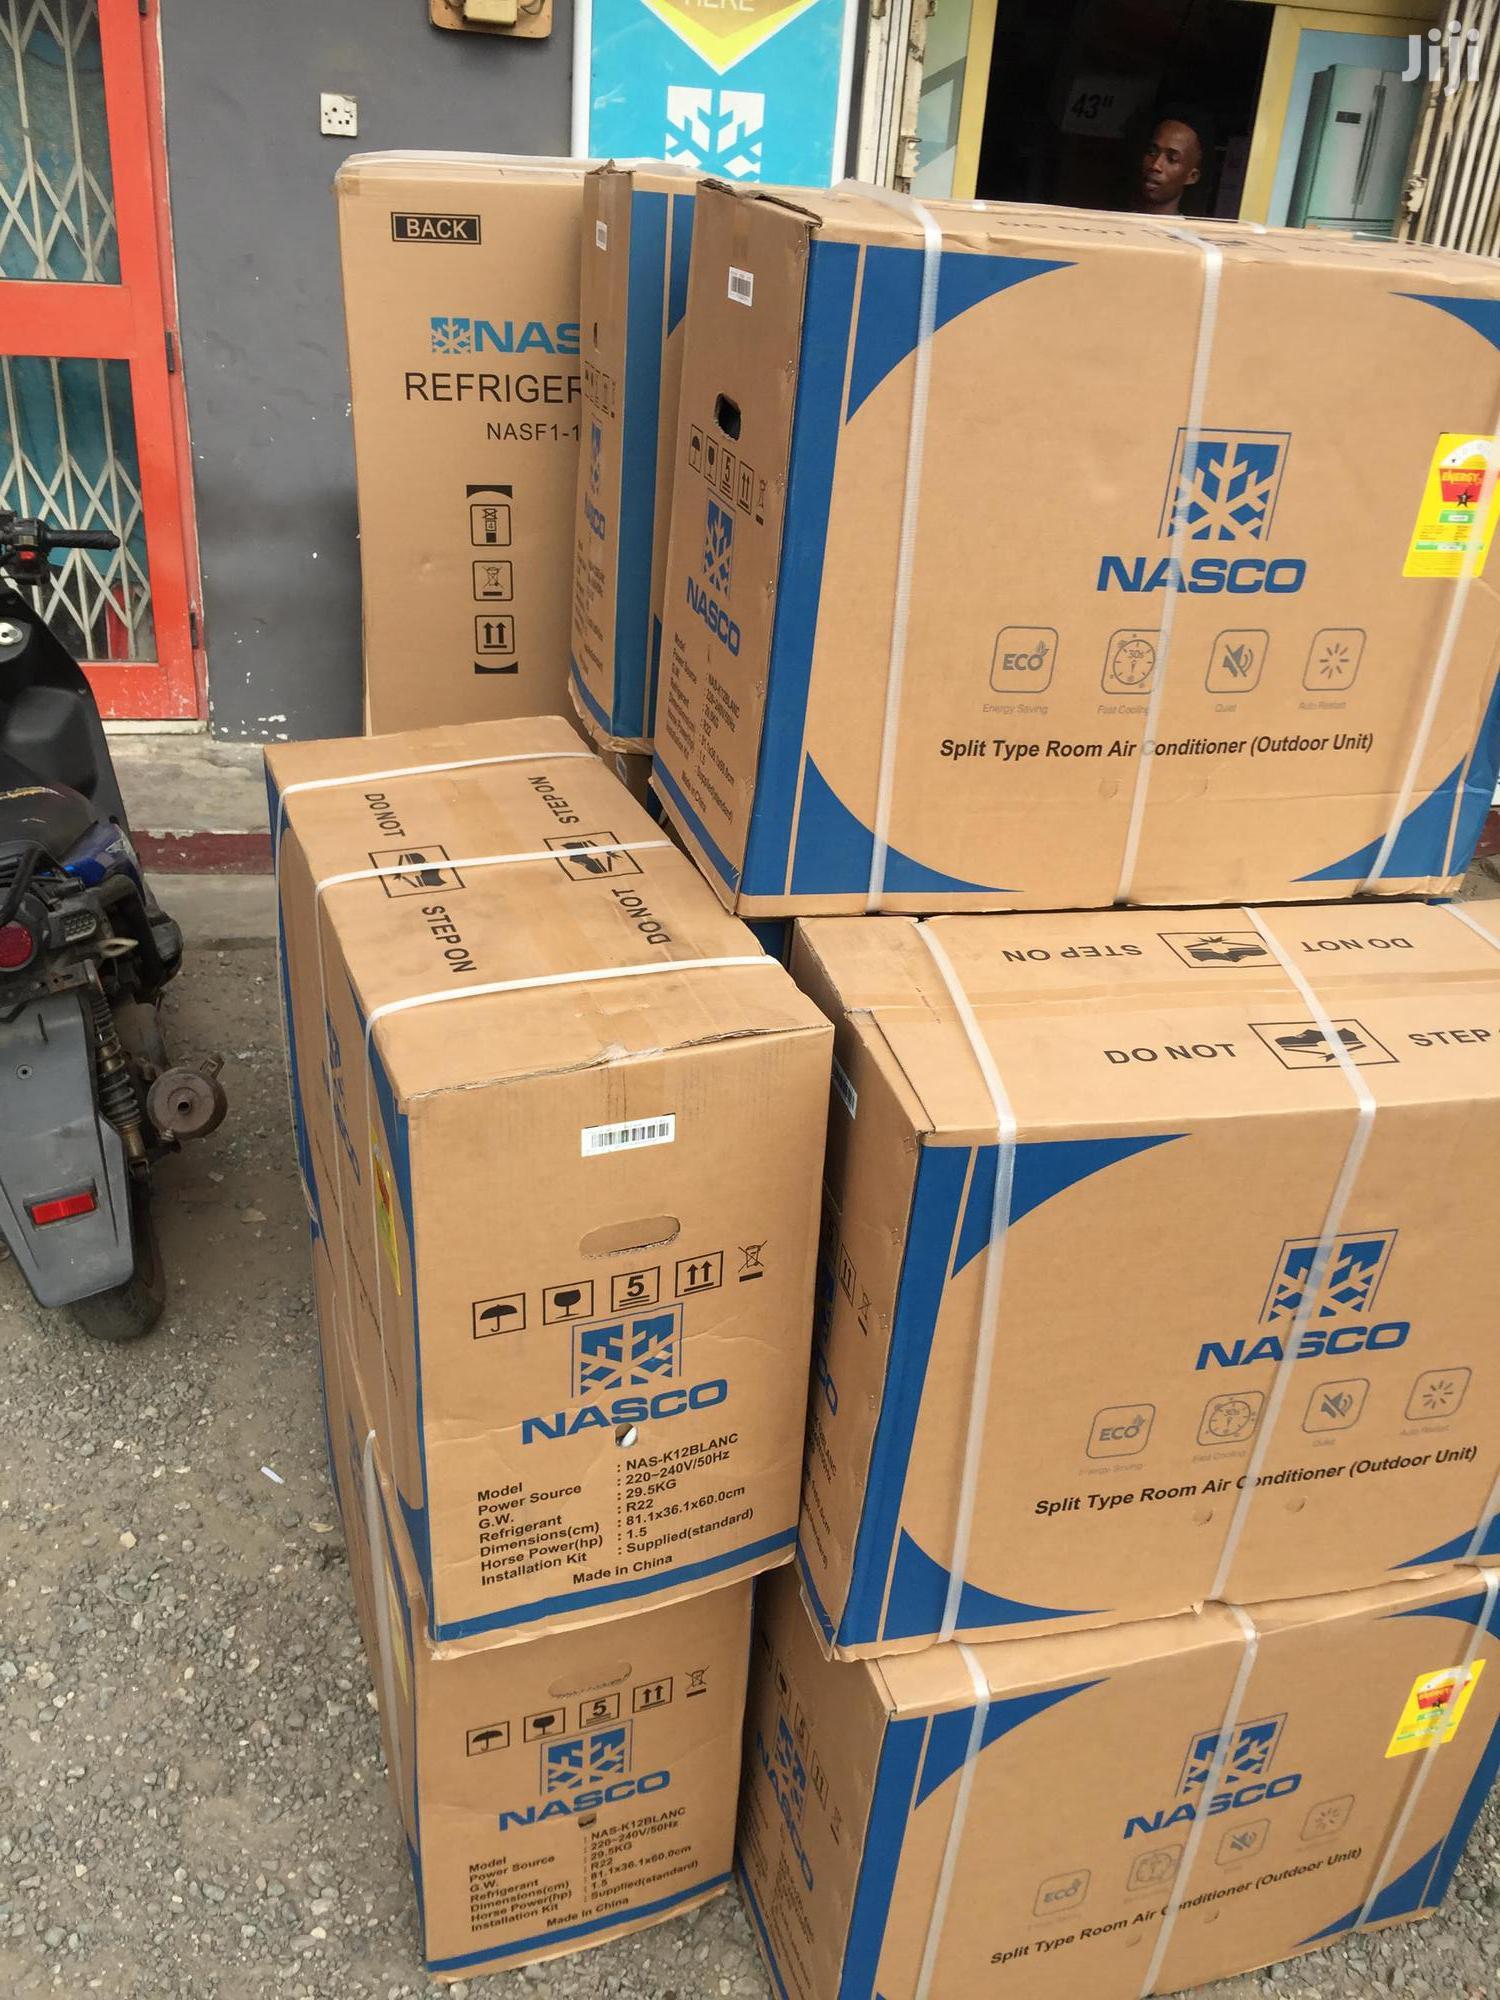 Buy The New Nasco 1.5 Horse Power Split Air Condition(Original Type)*